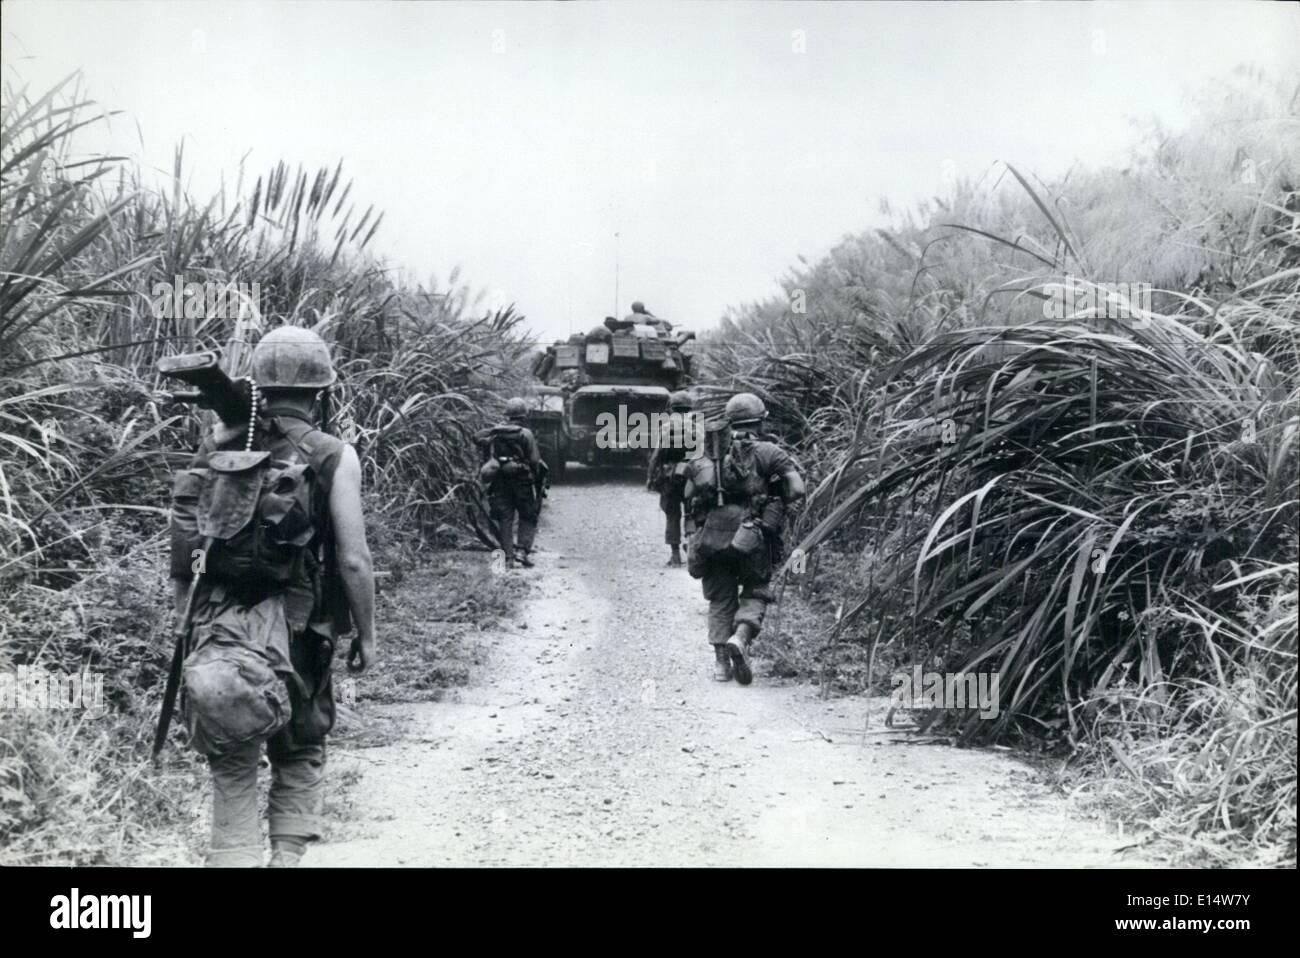 Vietnam War 1954-1975 Apr-18-2012-in-ambush-country-usmarines-follow-an-m-48-tank-along-E14W7Y